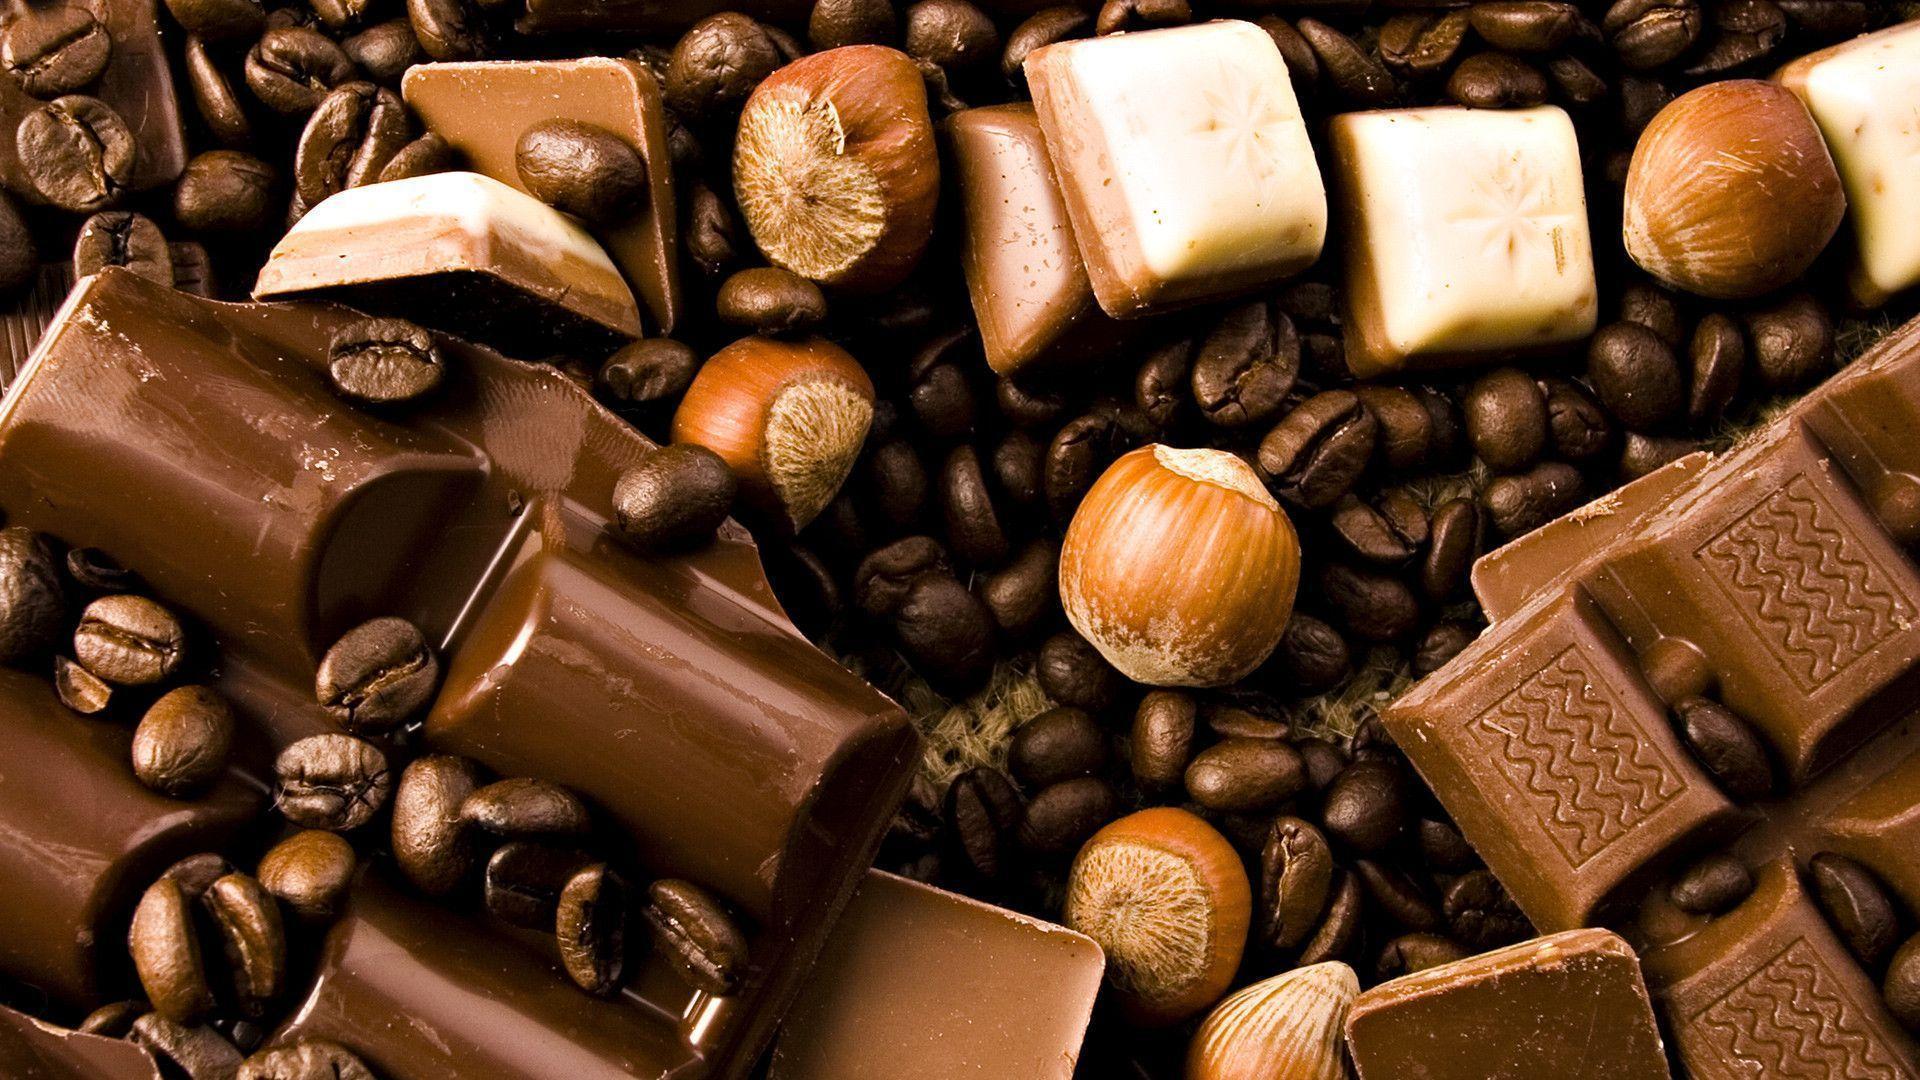 Fondos De Pantalla De Chocolates: Chocolate Wallpapers